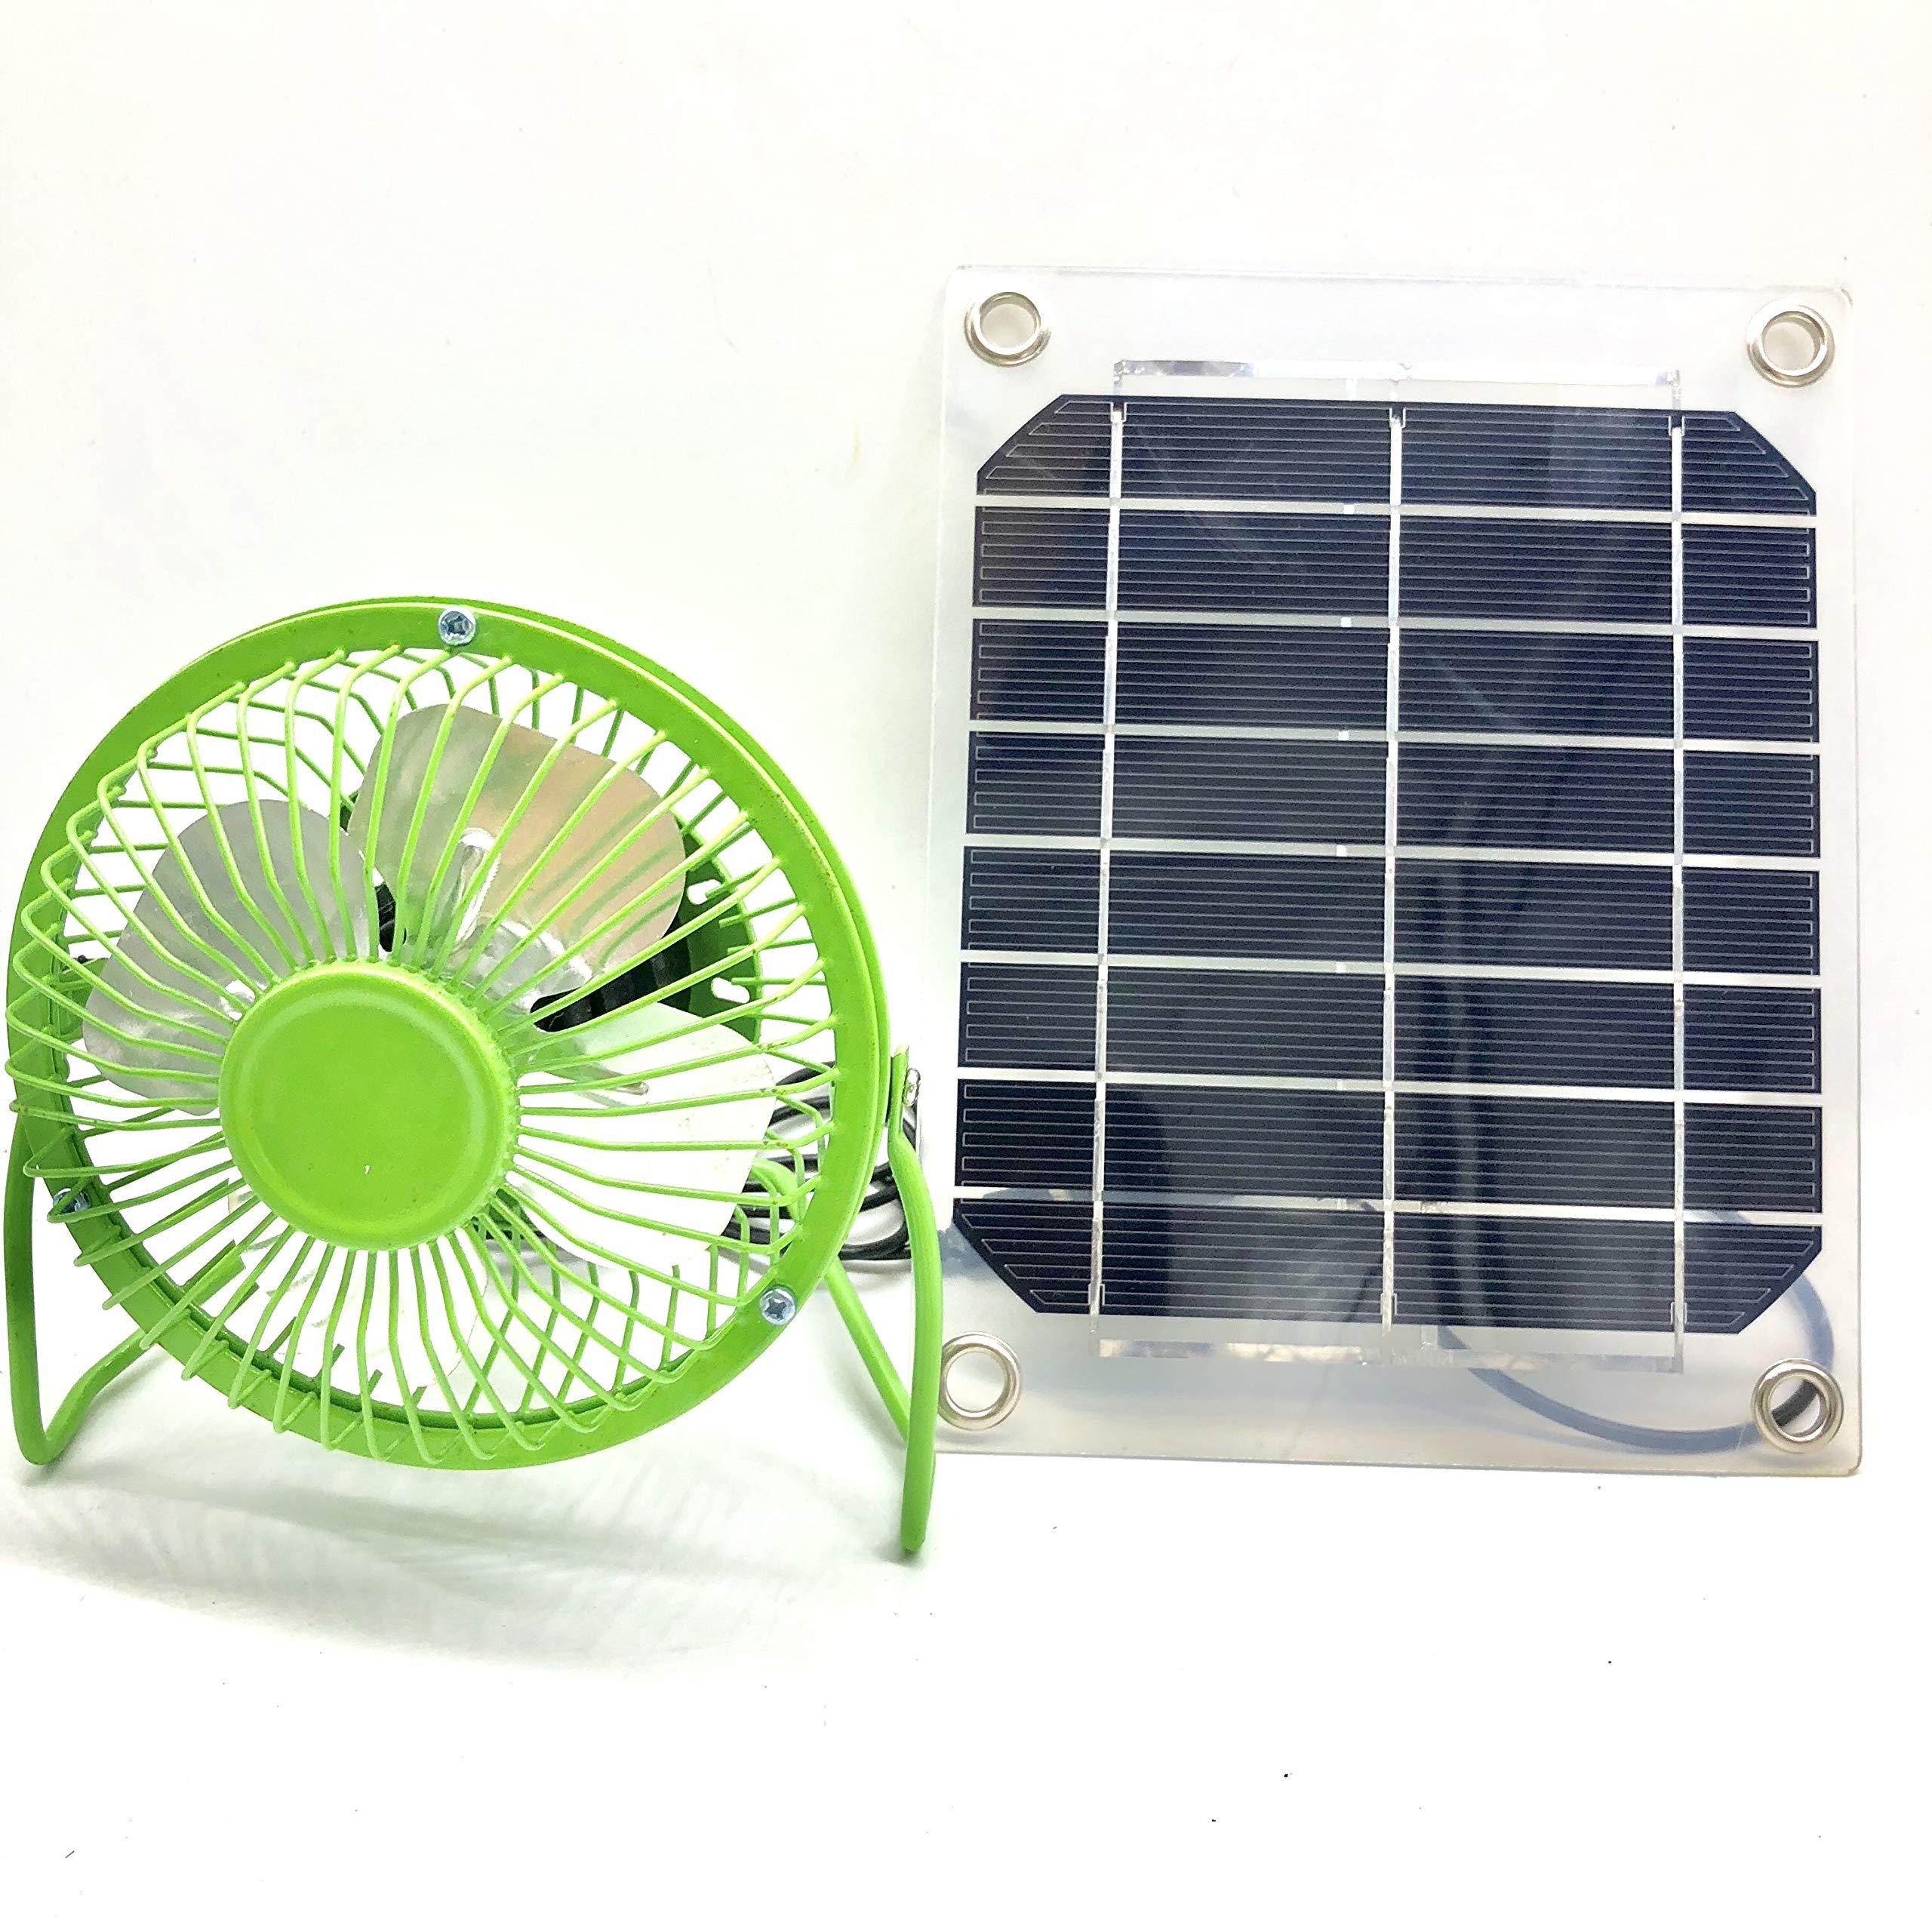 Solar Energy System 5W Solar Panel + 4 Inch Fan Solar Powered Fan Outdoor Home Cooling Ventilator Cooling Fan Solar Cooling Fan Office Home Decor